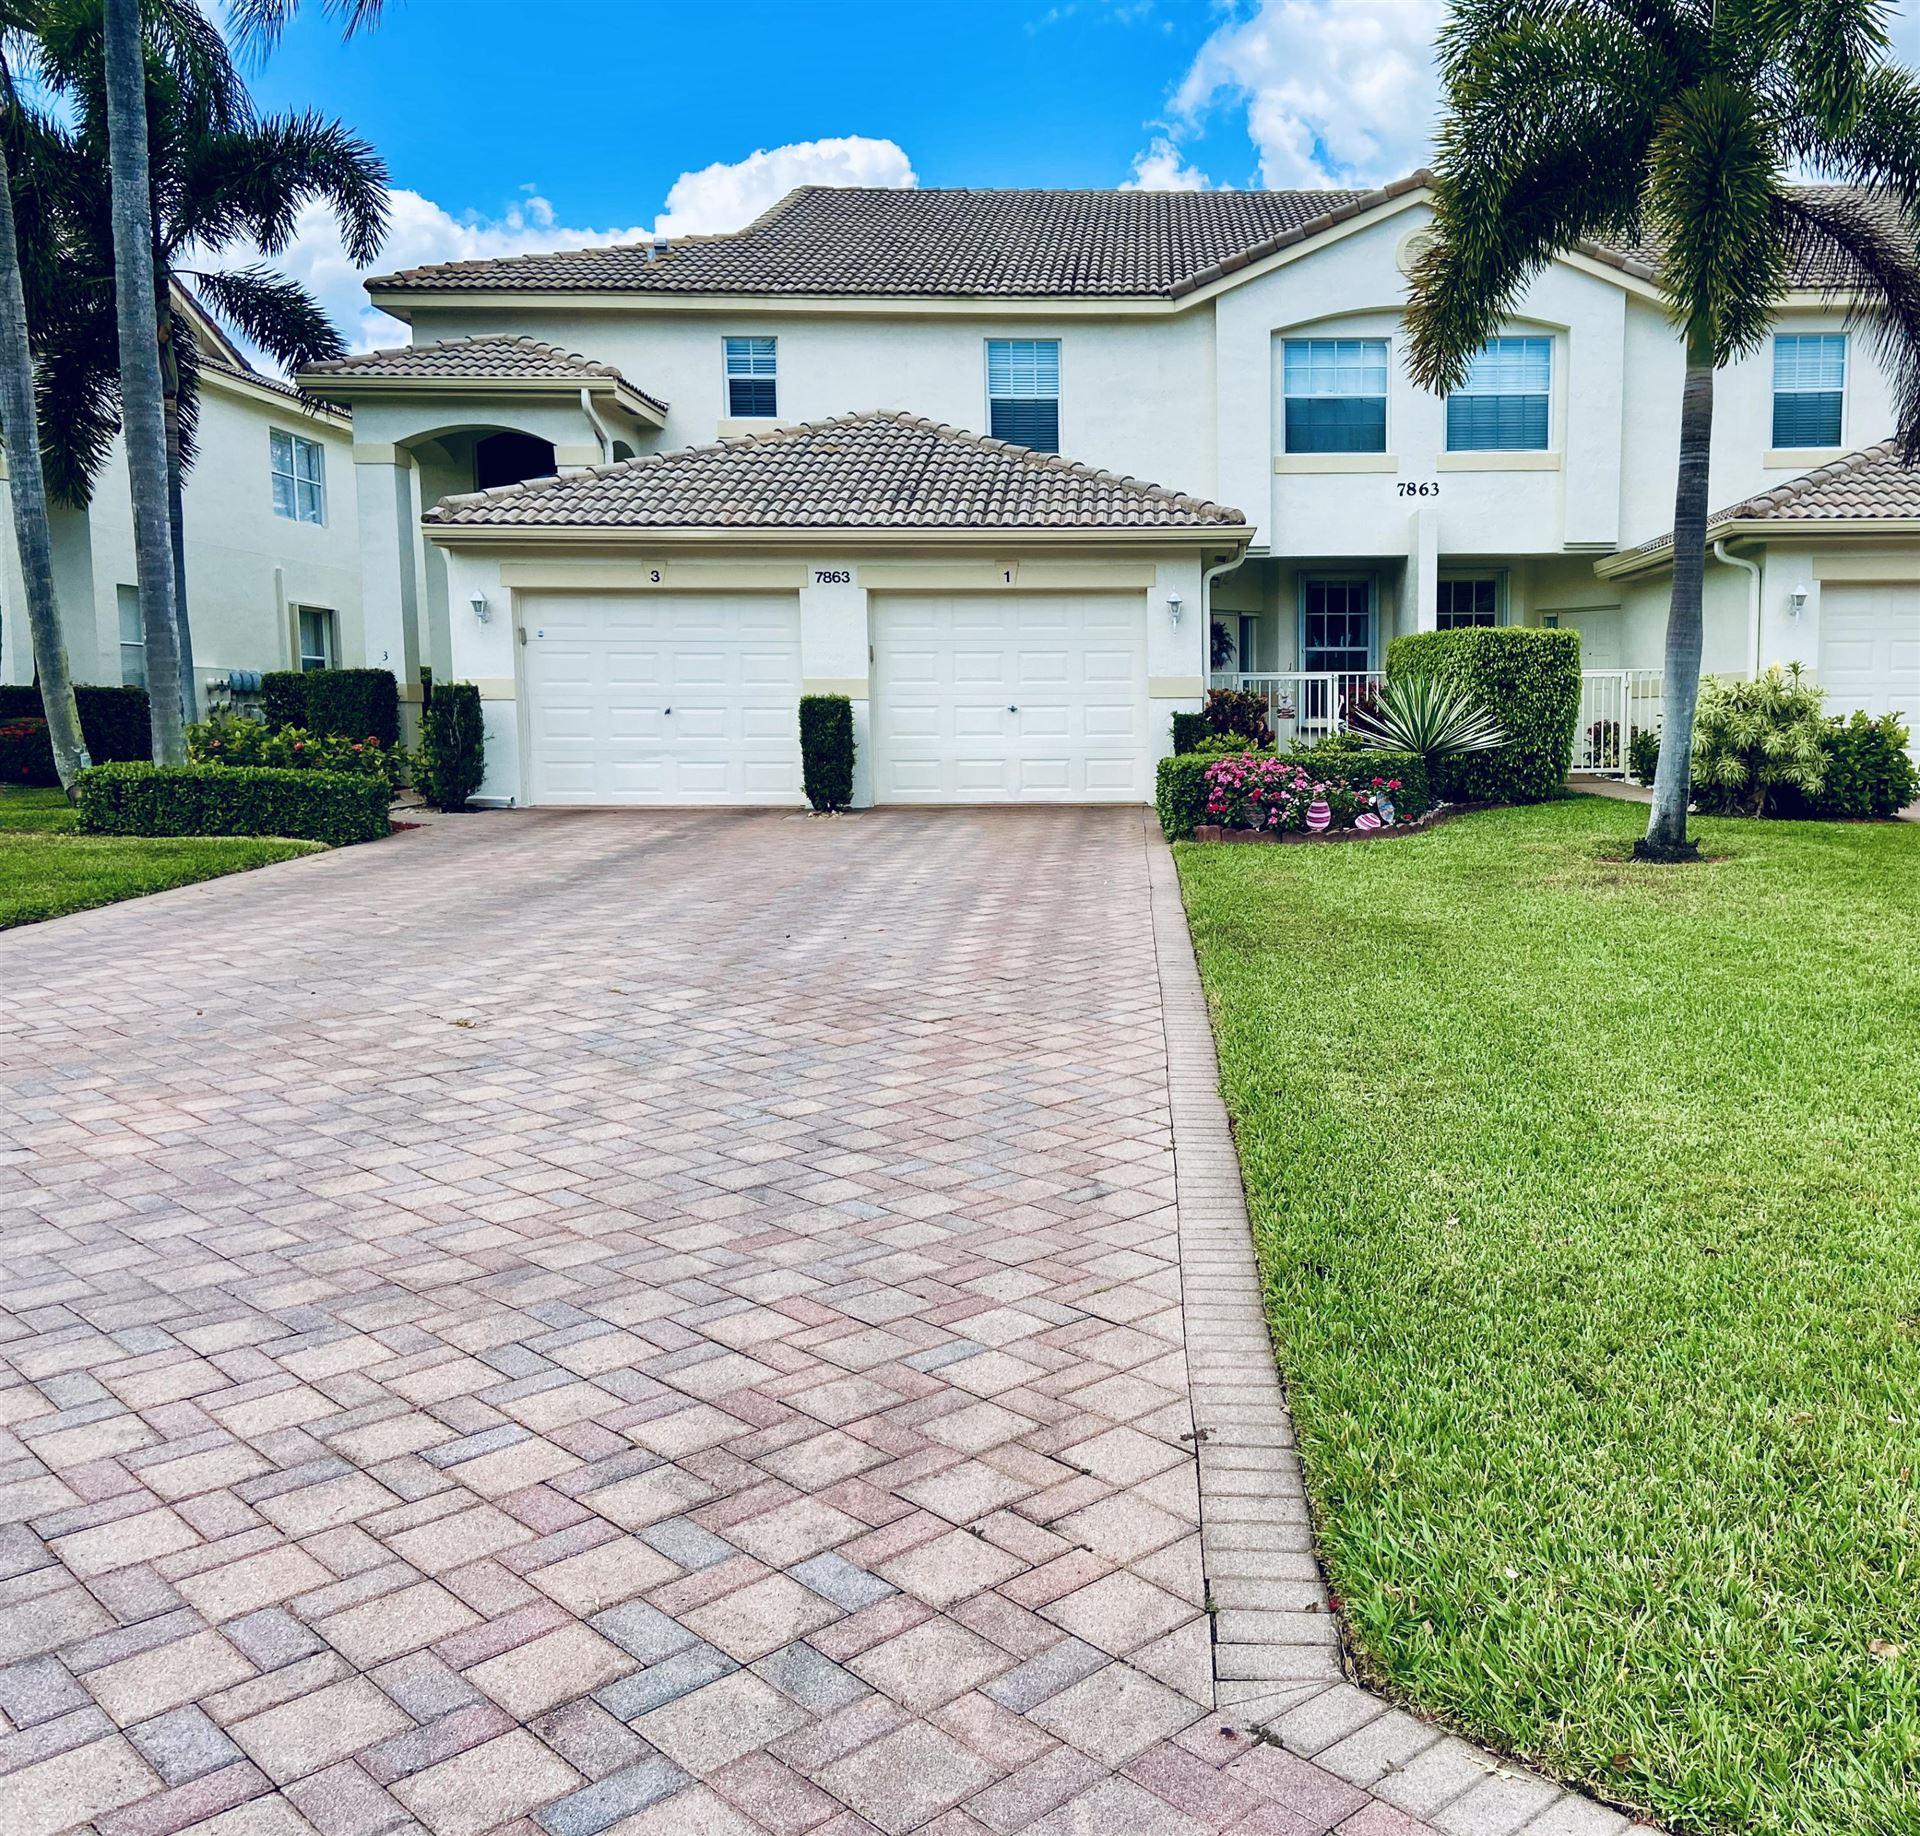 7863 Laina Lane #1, Boynton Beach, FL 33437 - MLS#: RX-10705610